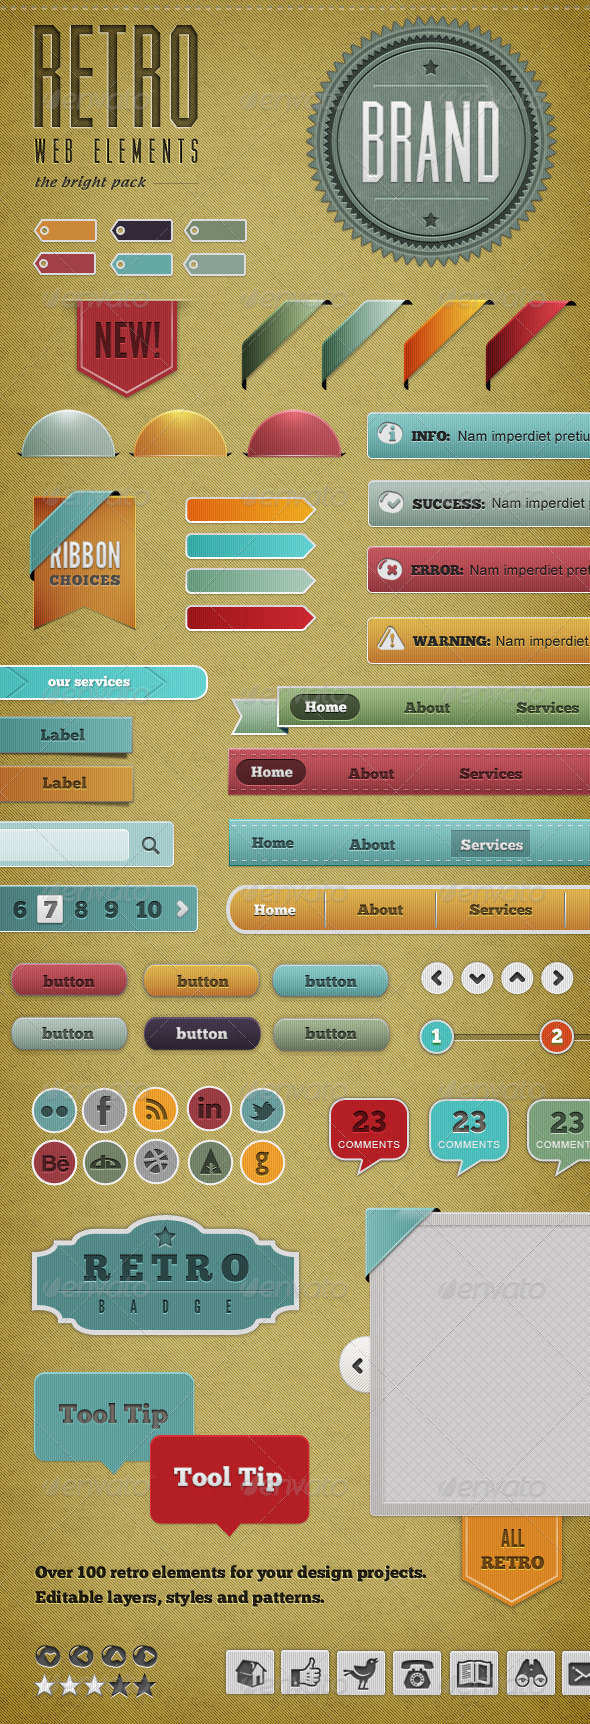 Graphic River Retro Web Elements Bright Pack Web Elements -  Miscellaneous 743187